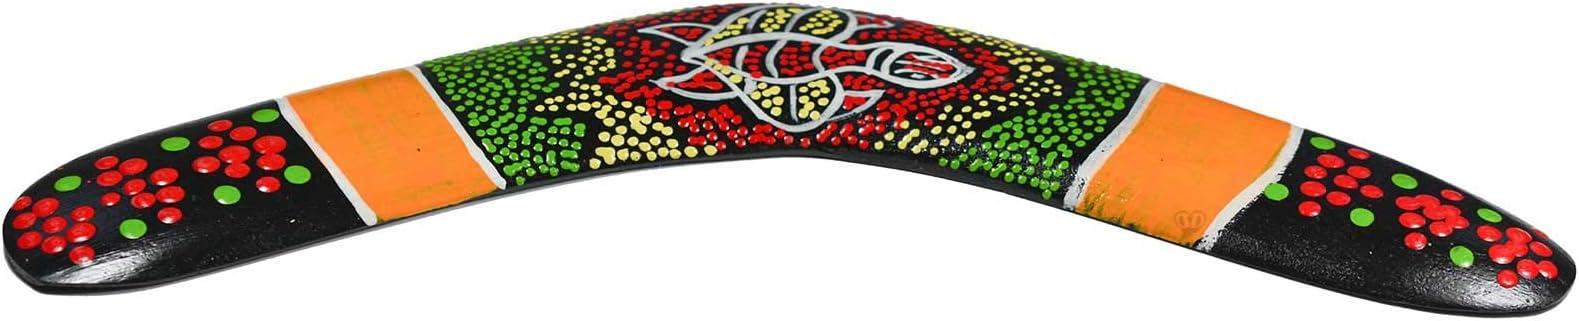 maDDma ® 1 Bumerang Decorativo de Madera, Aprox. 30 cm Dotpaint ...